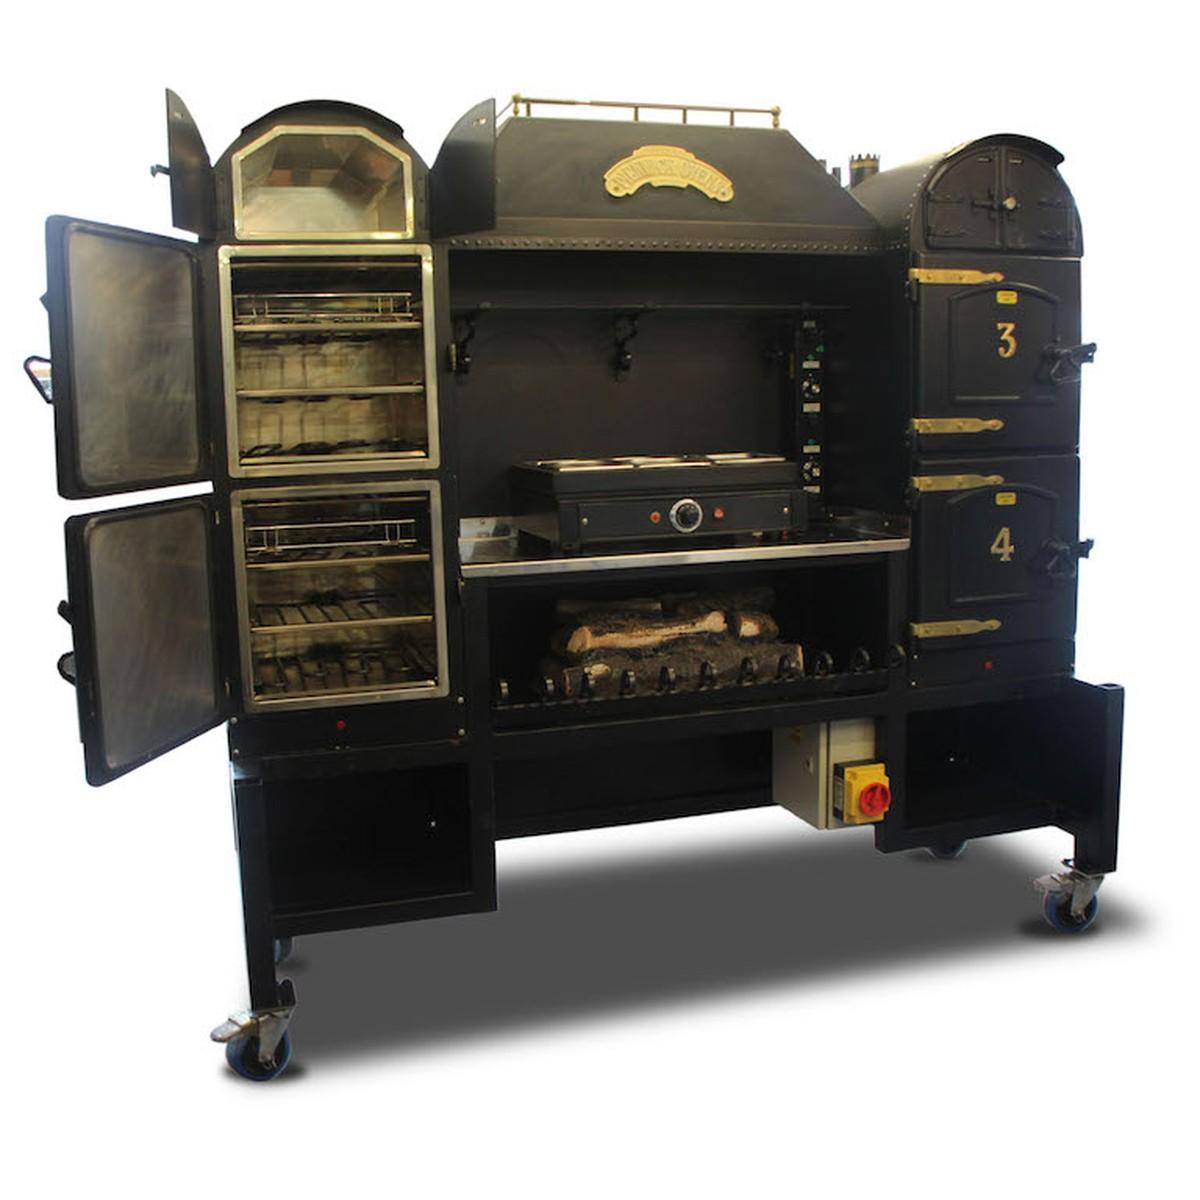 Secondhand Catering Equipment Potato Oven Victorian